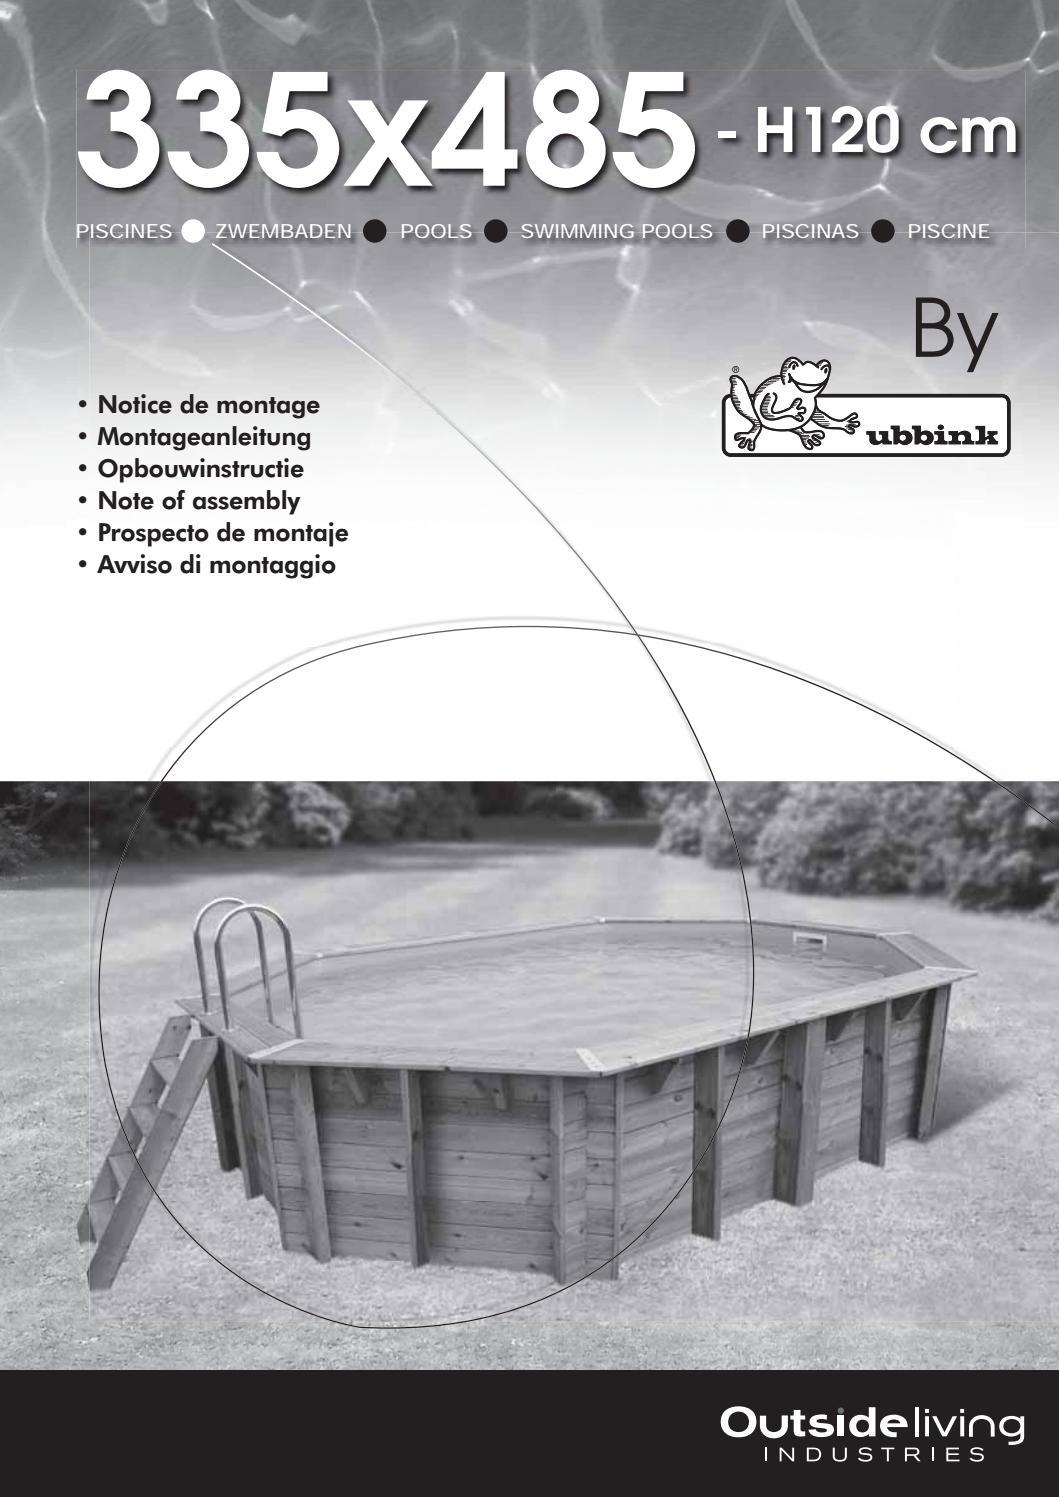 Notice 335X485 - H120-2018_1 K.pdf By ____ - Issuu à Filtre A Sable Piscine Mode D Emploi